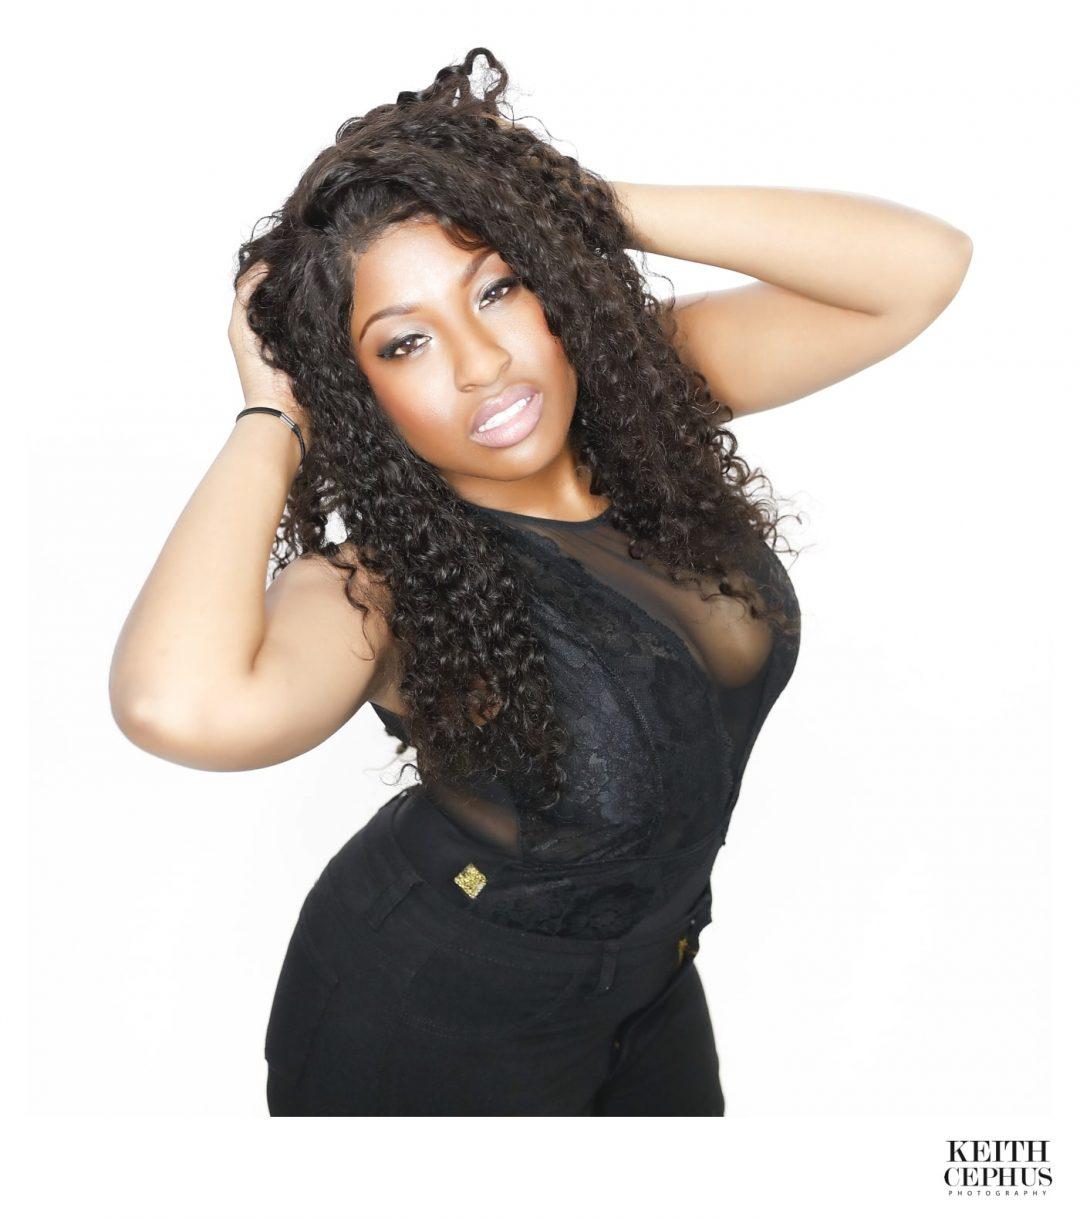 Virginia Beach Hair Photographer | NuVirginHair Marketing and Branding Photo Shoot